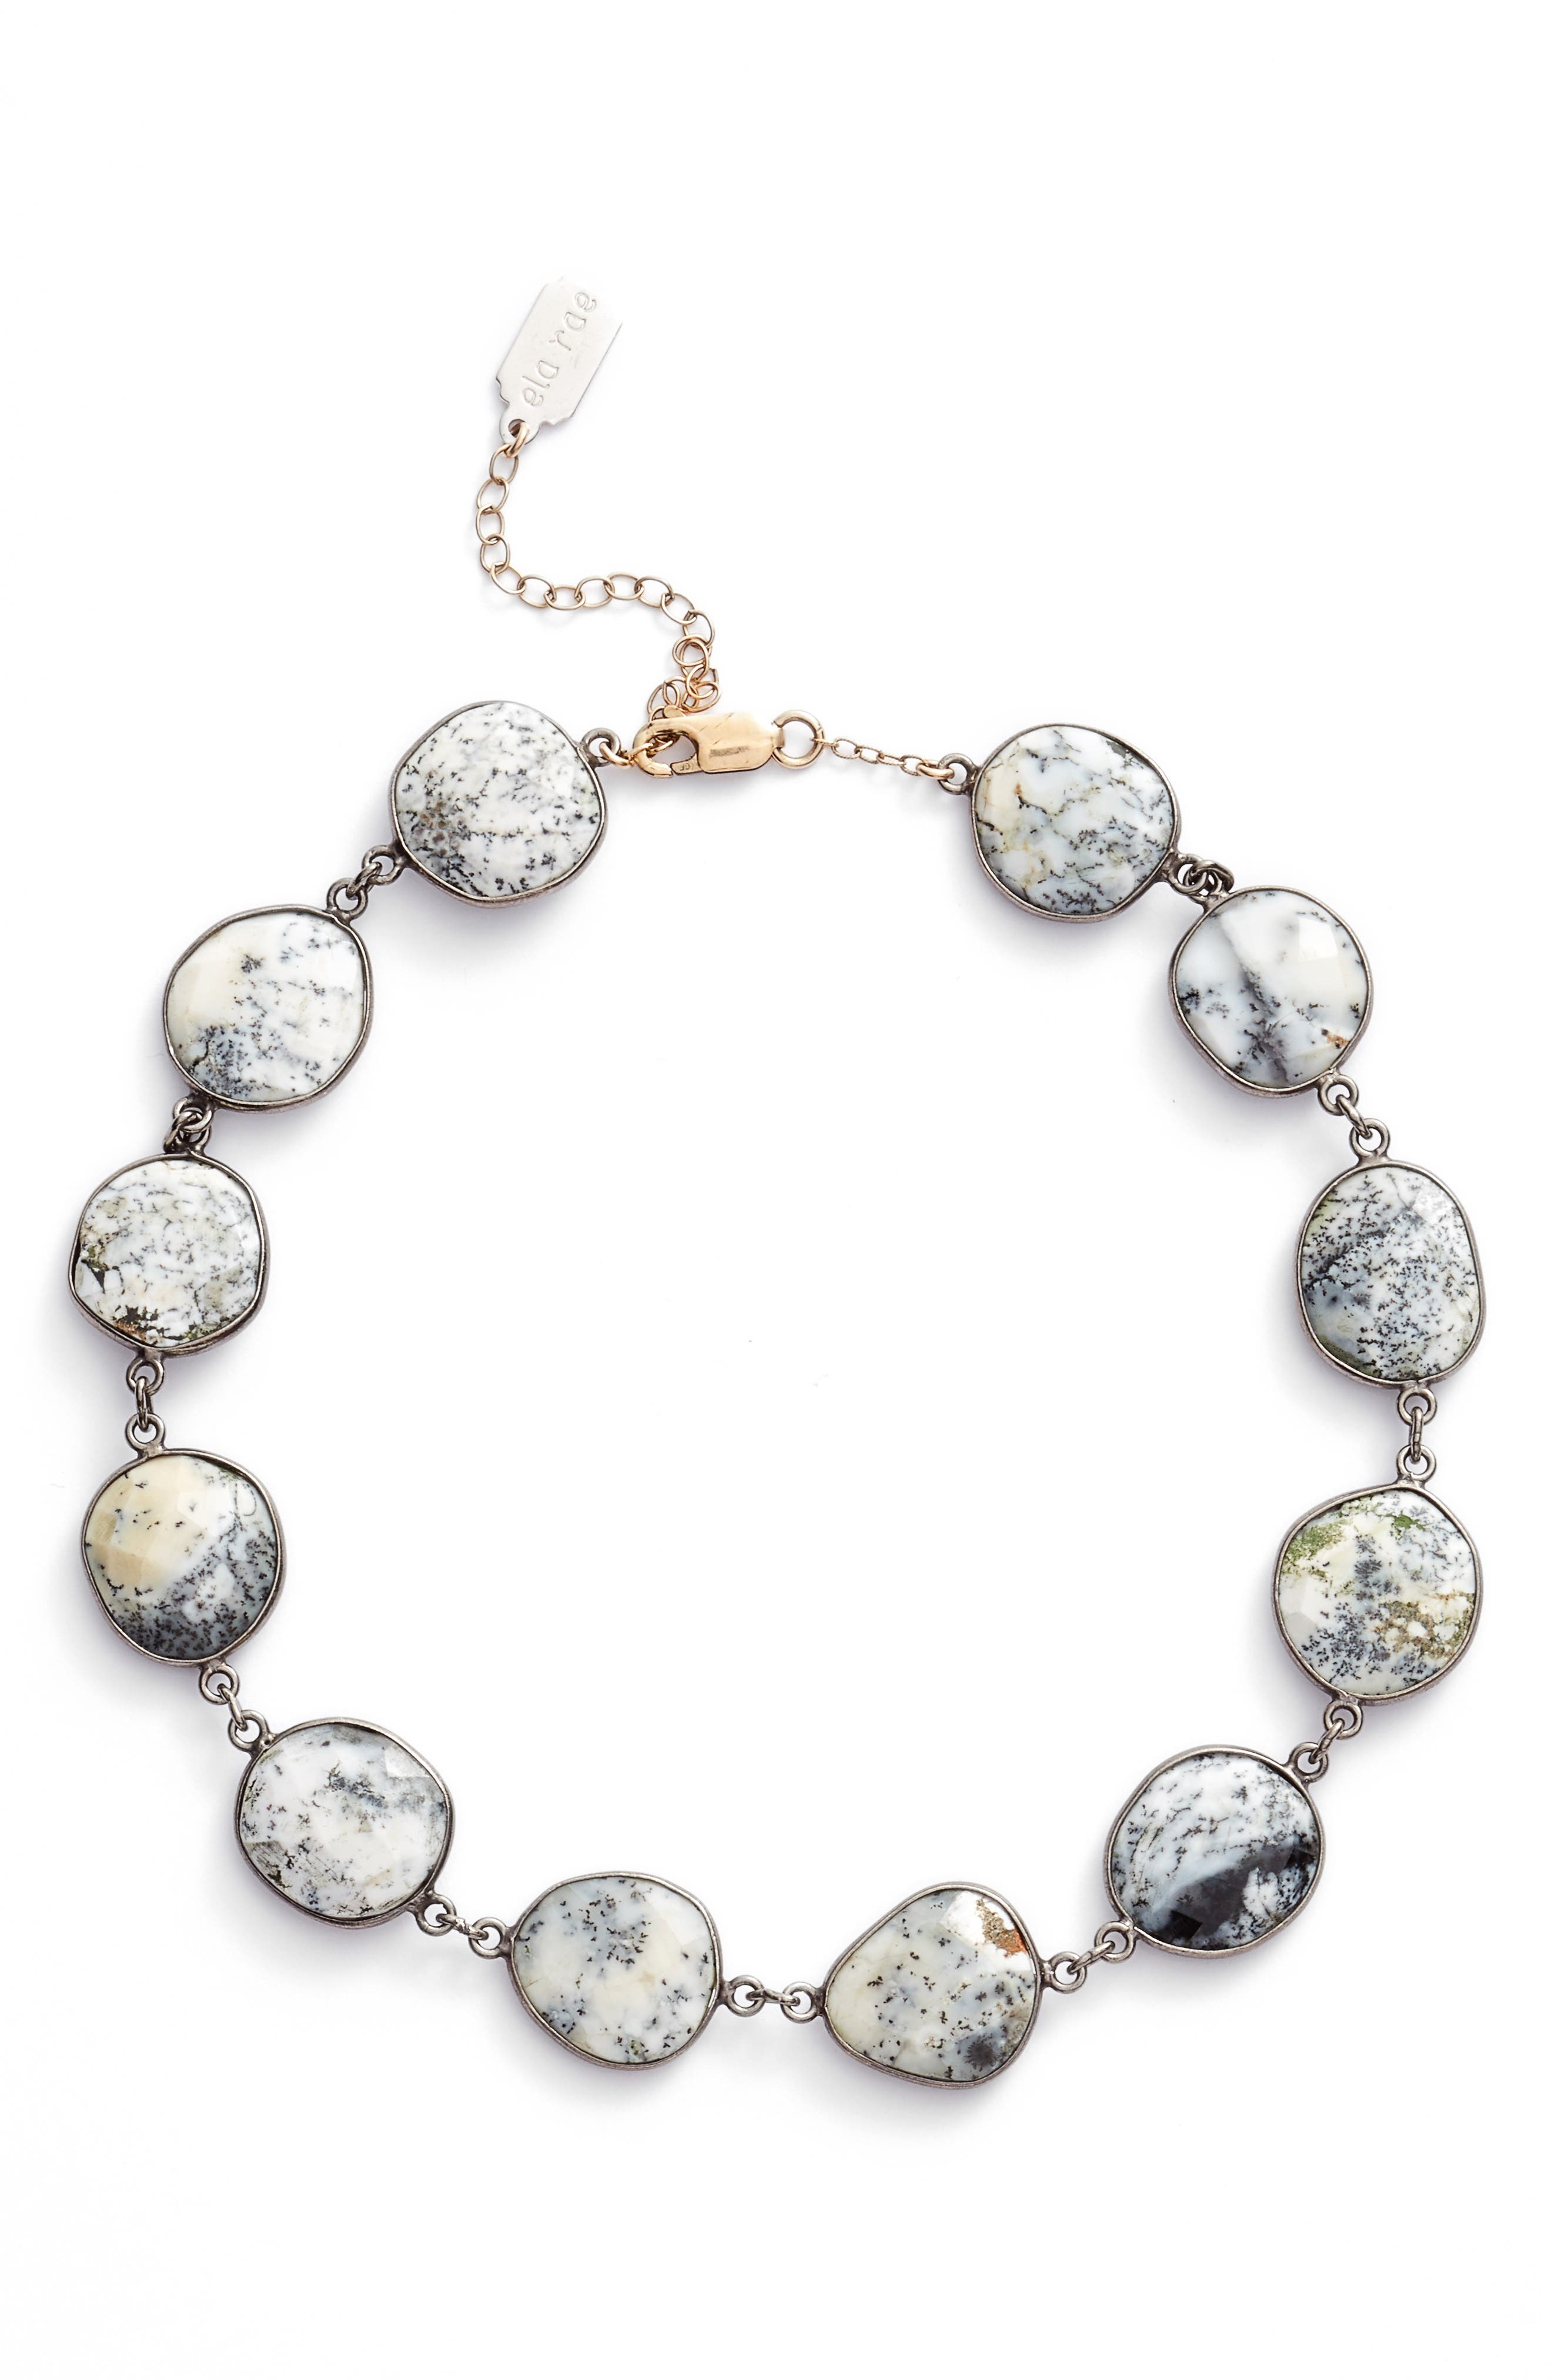 Suze Semiprecious Stone Collar Necklace,                         Main,                         color, DENDRITE OPAL